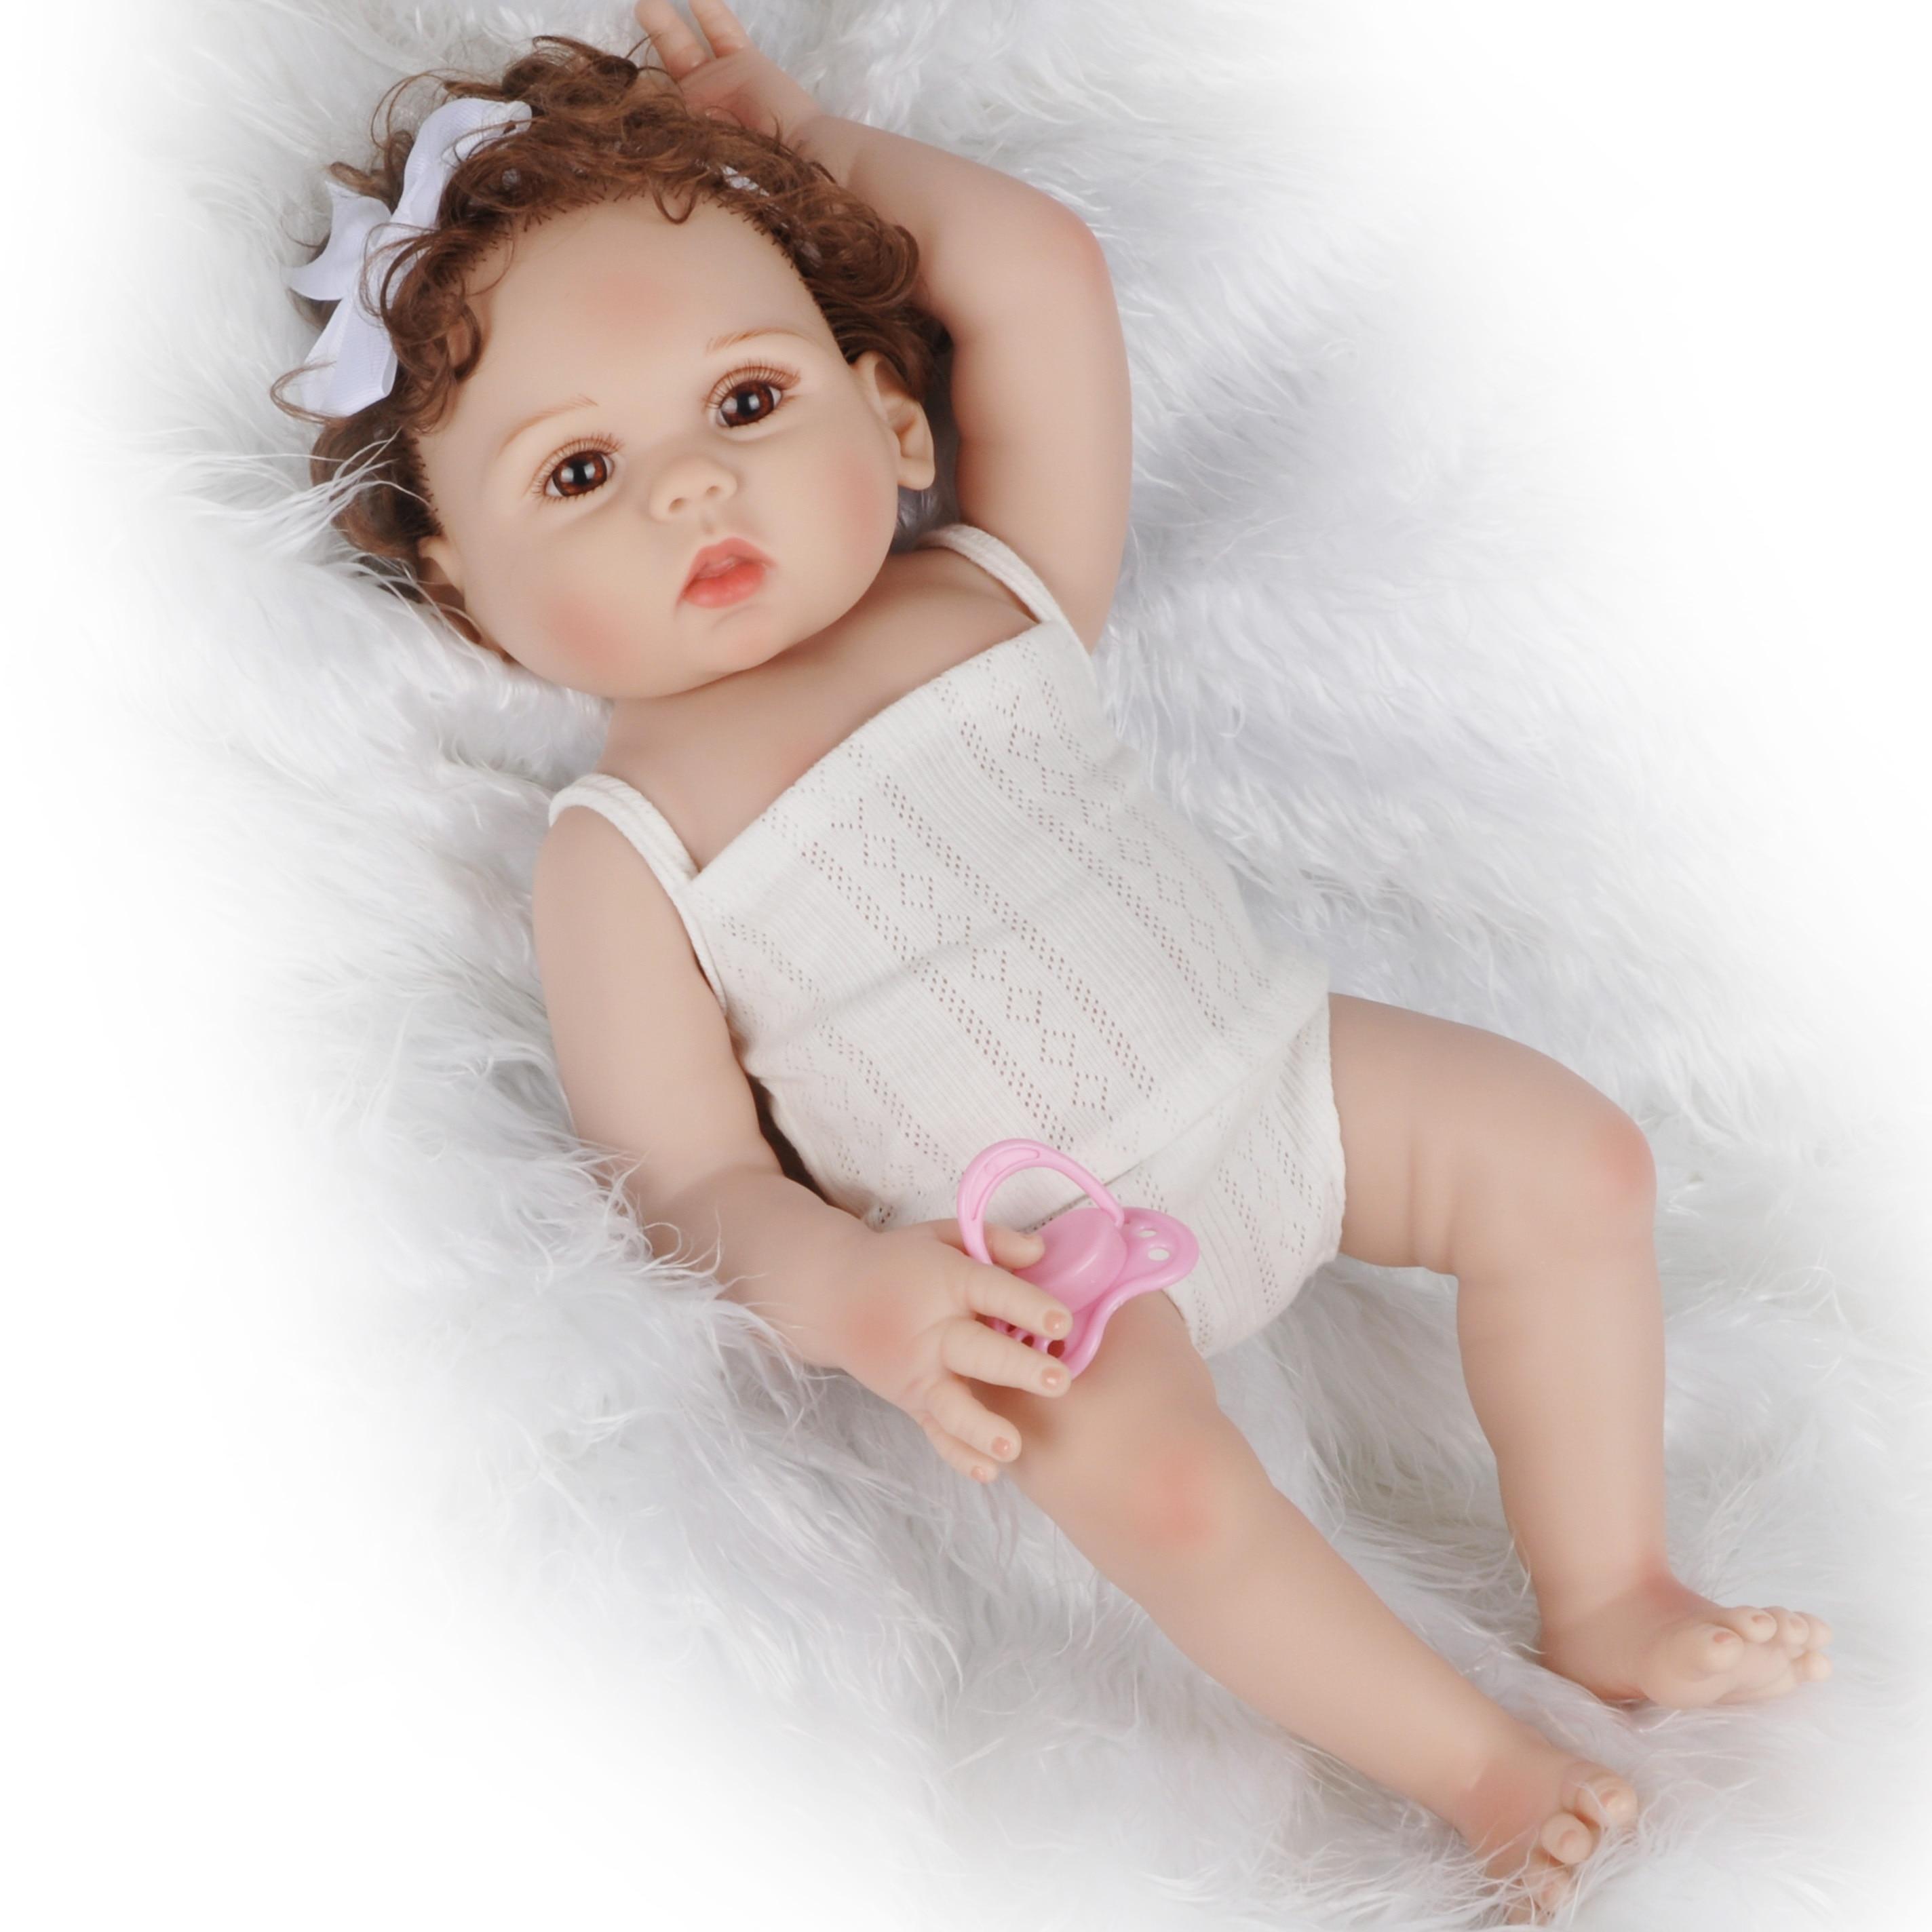 18 polegada 47cm reborn bebê boneca completa silicone bebe bonecas realista vivo bebê menino presente de natal brinquedos para crianças